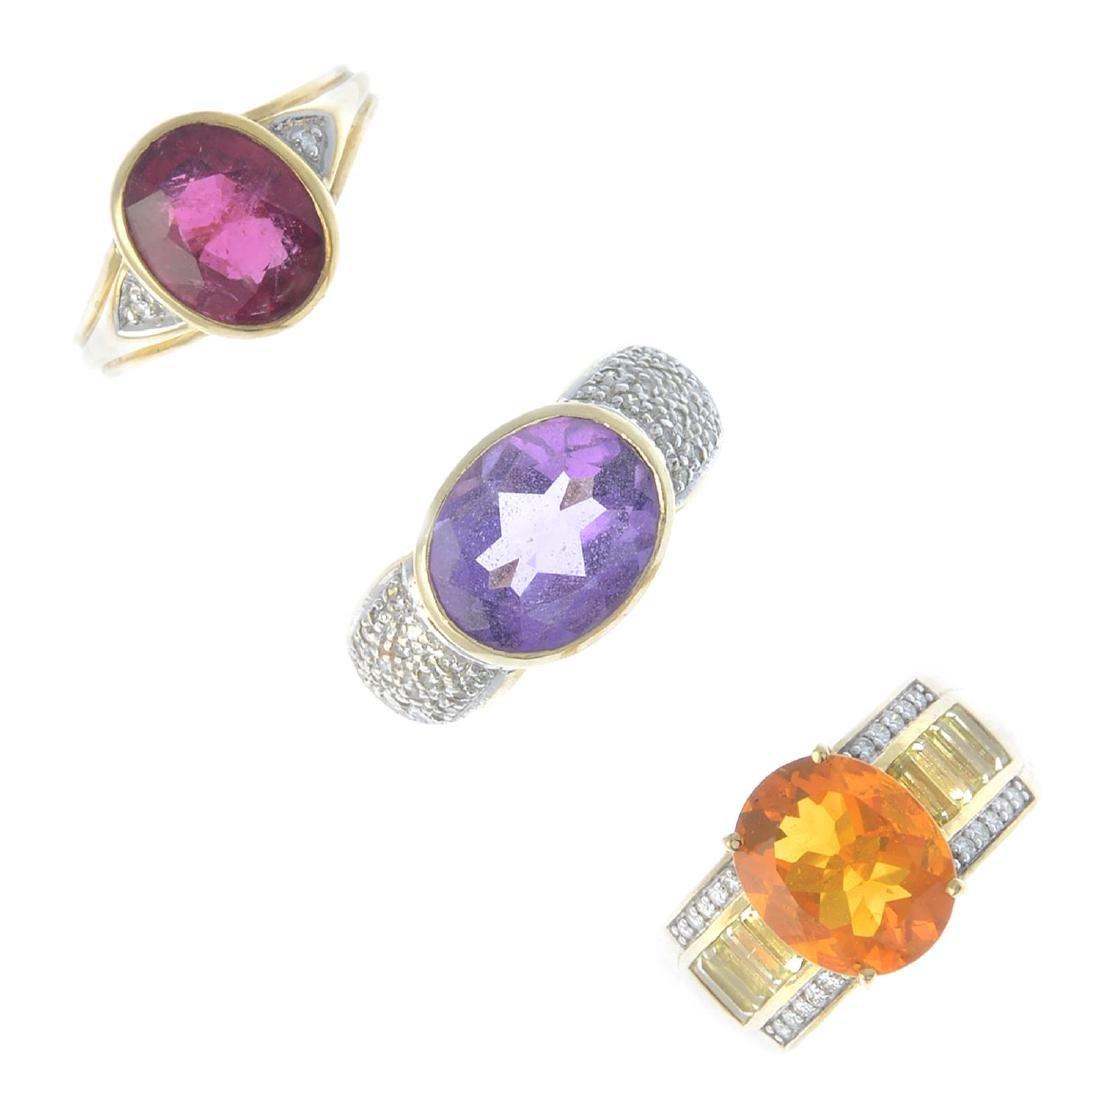 Three 9ct gold diamond and gem-set dress rings. To